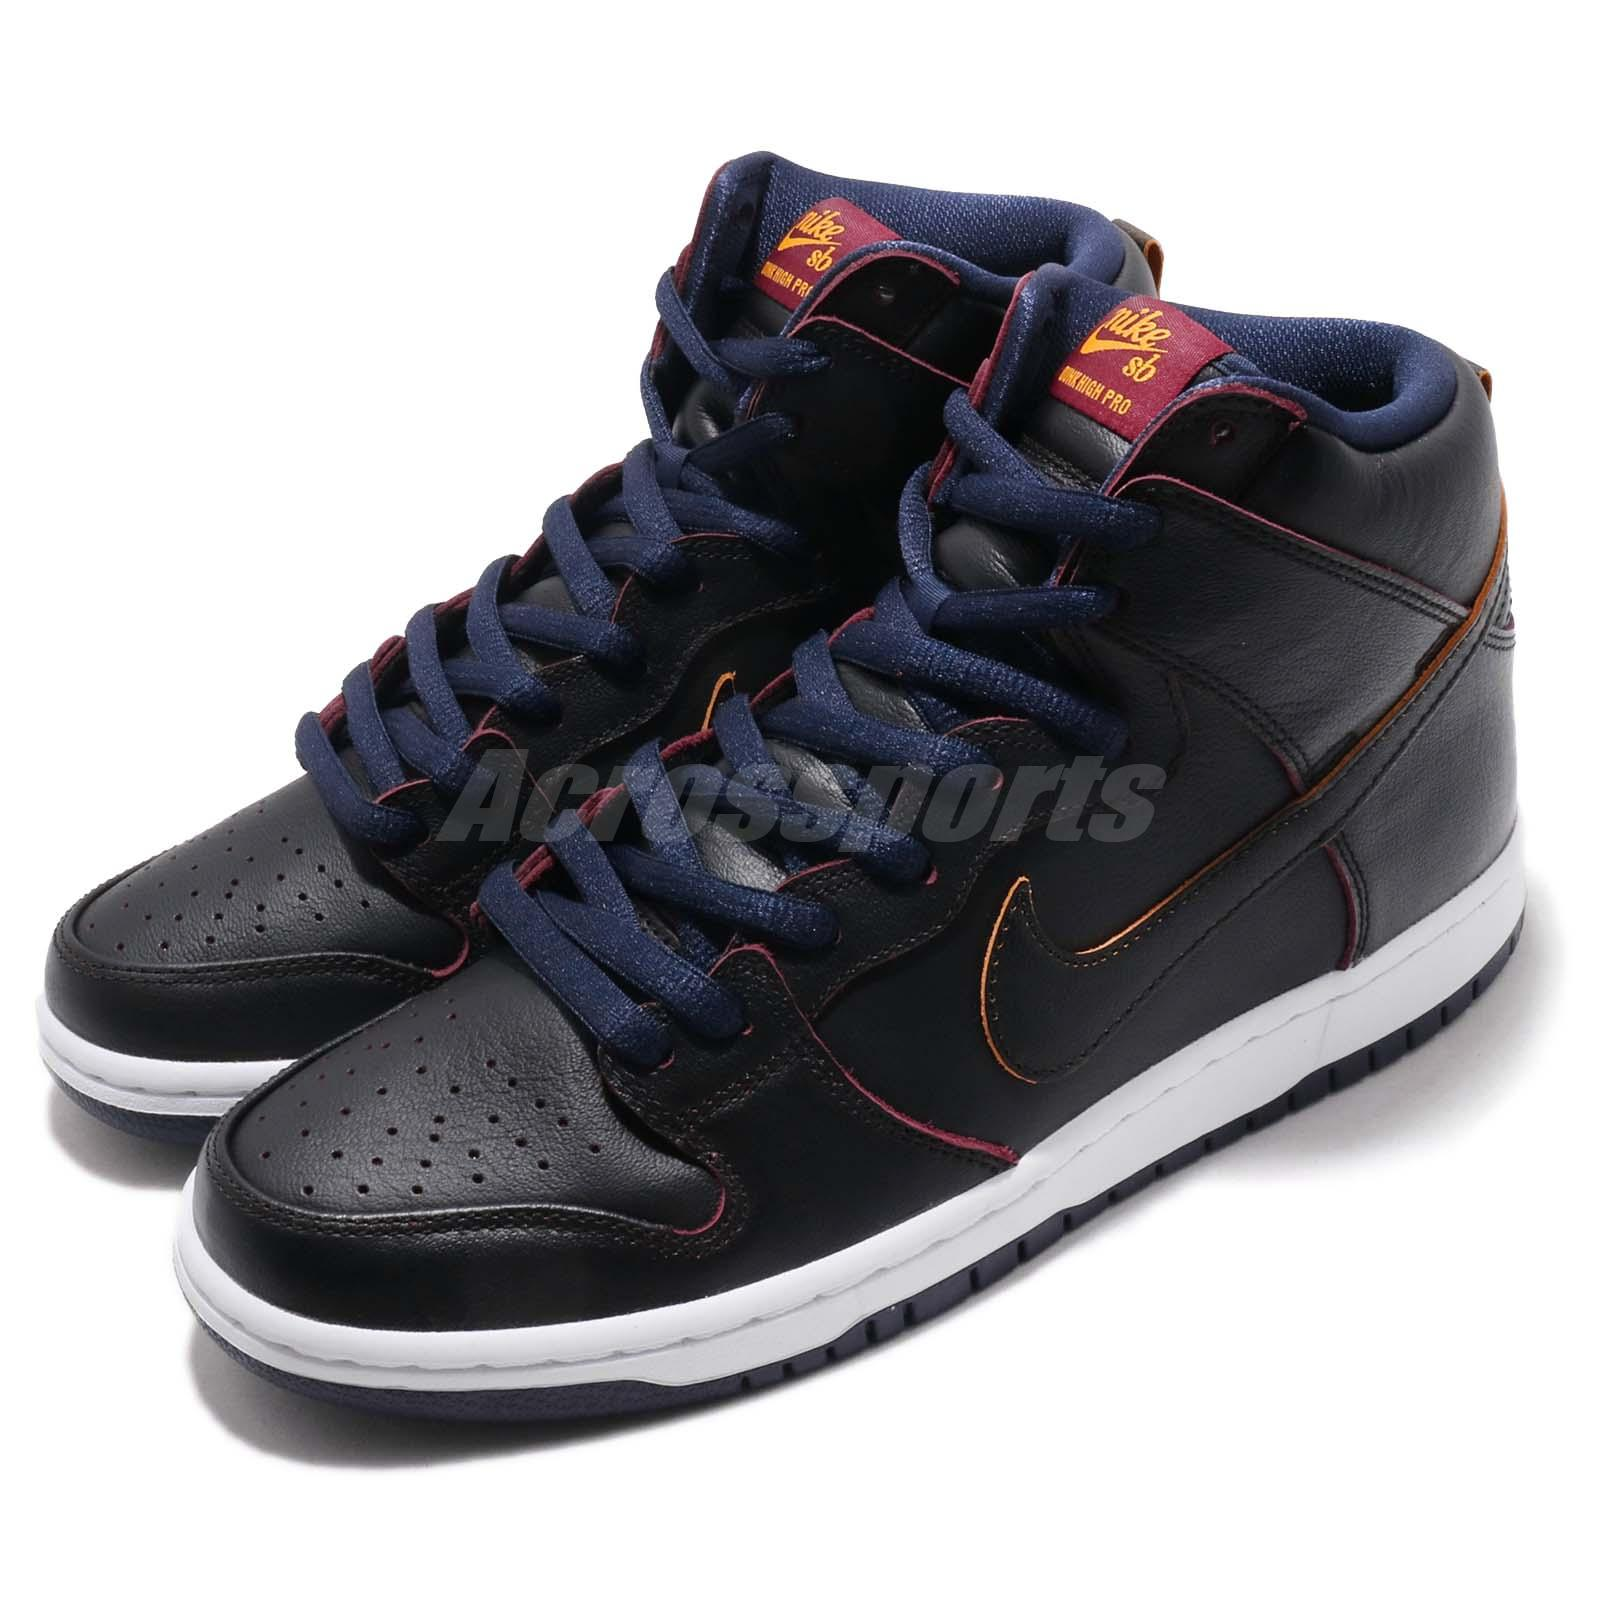 5815c507306790 Nike SB Dunk High Pro NBA Cleveland Cavaliers Black Navy Cavs Shoes ...